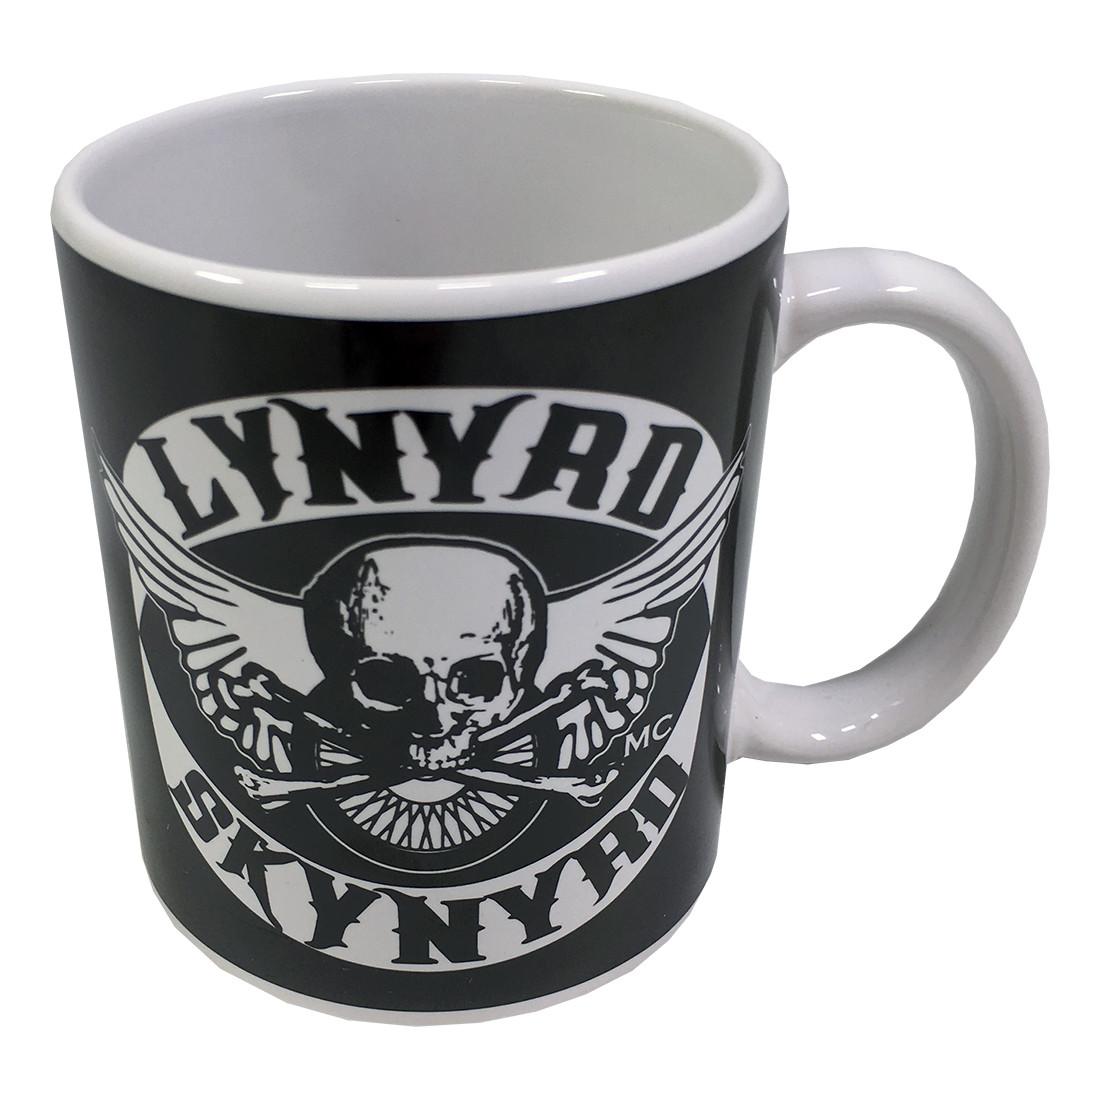 Skynyrd Biker Patch Mug Black